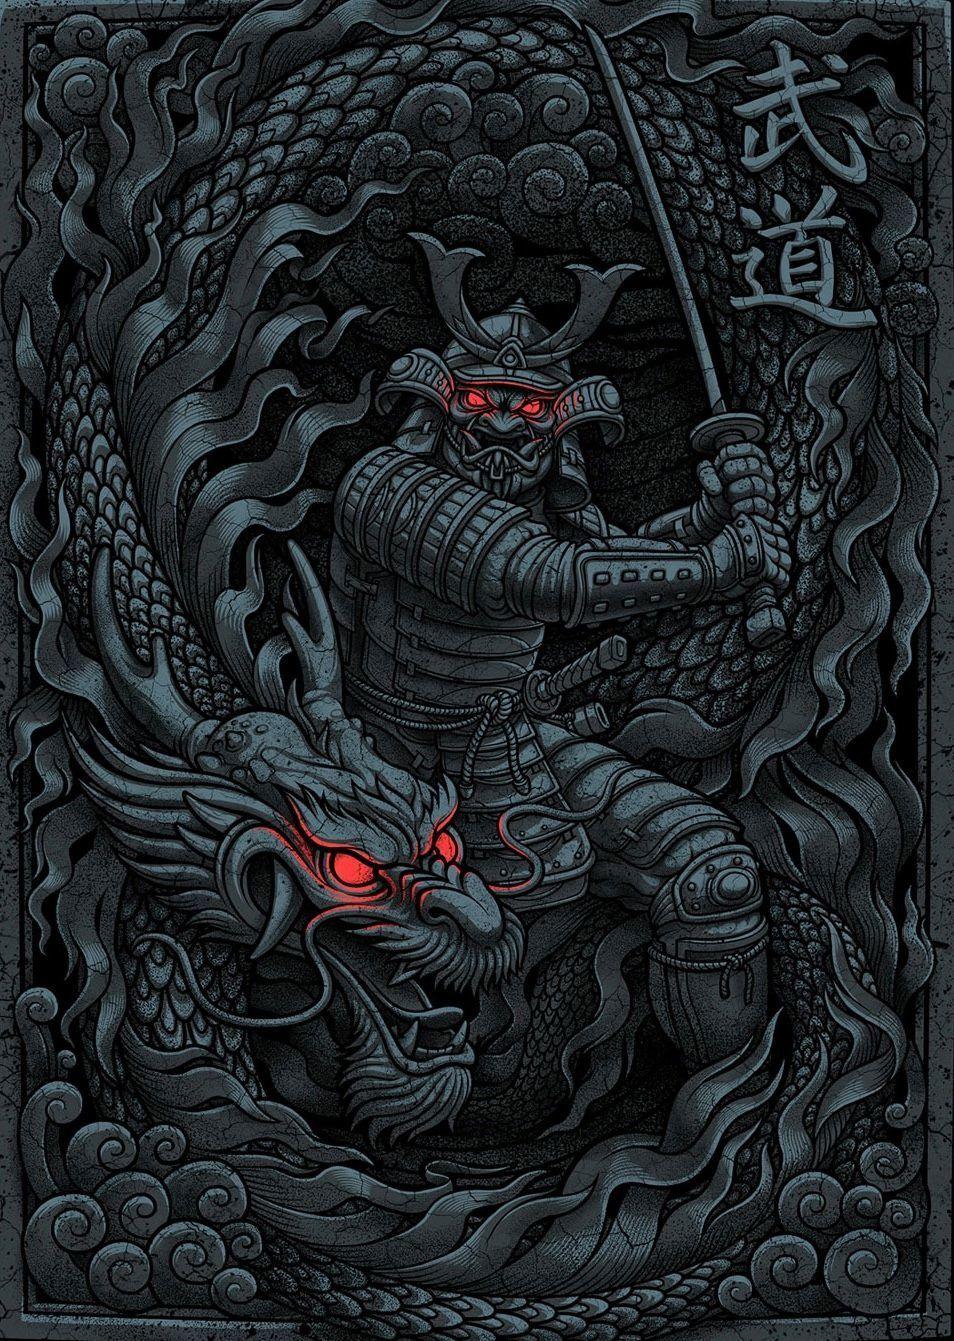 Pin De Fred Rosa Em Anubis Pinterest Samurai Samurai Art E